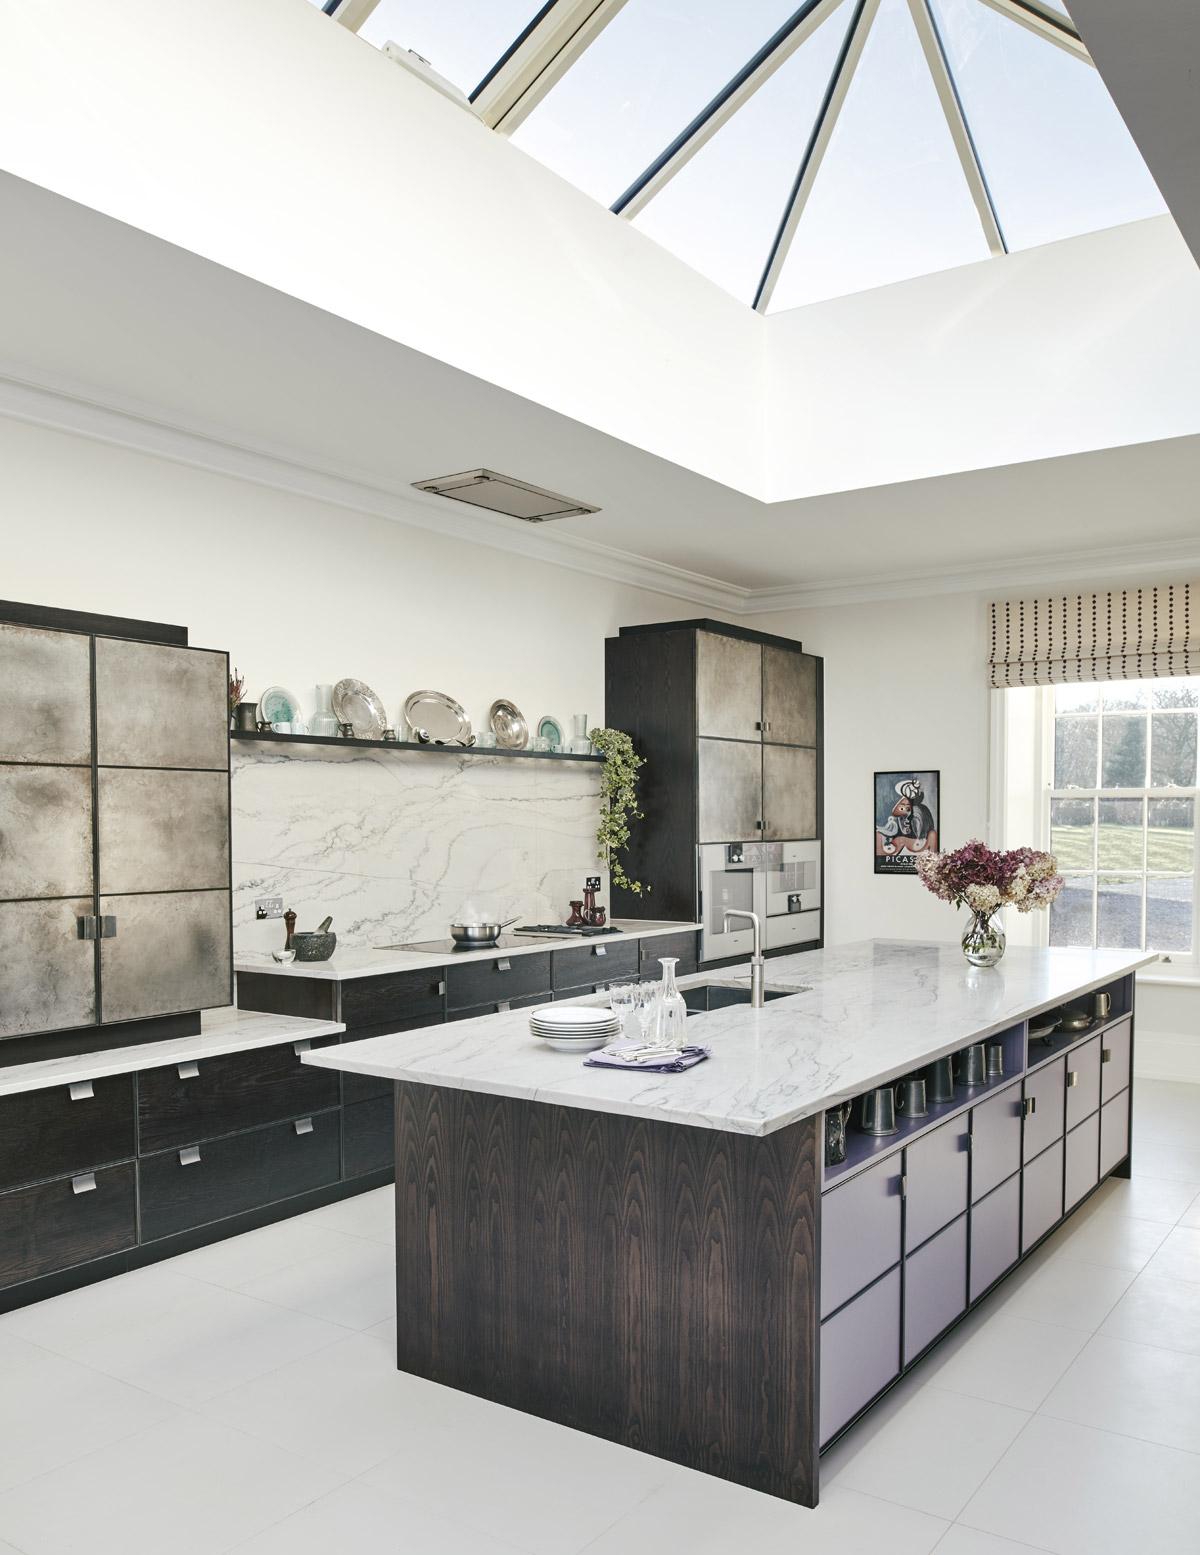 kitchen design, Q&A: Exploring kitchen design with Charlie Smallbone of Ledbury Studio